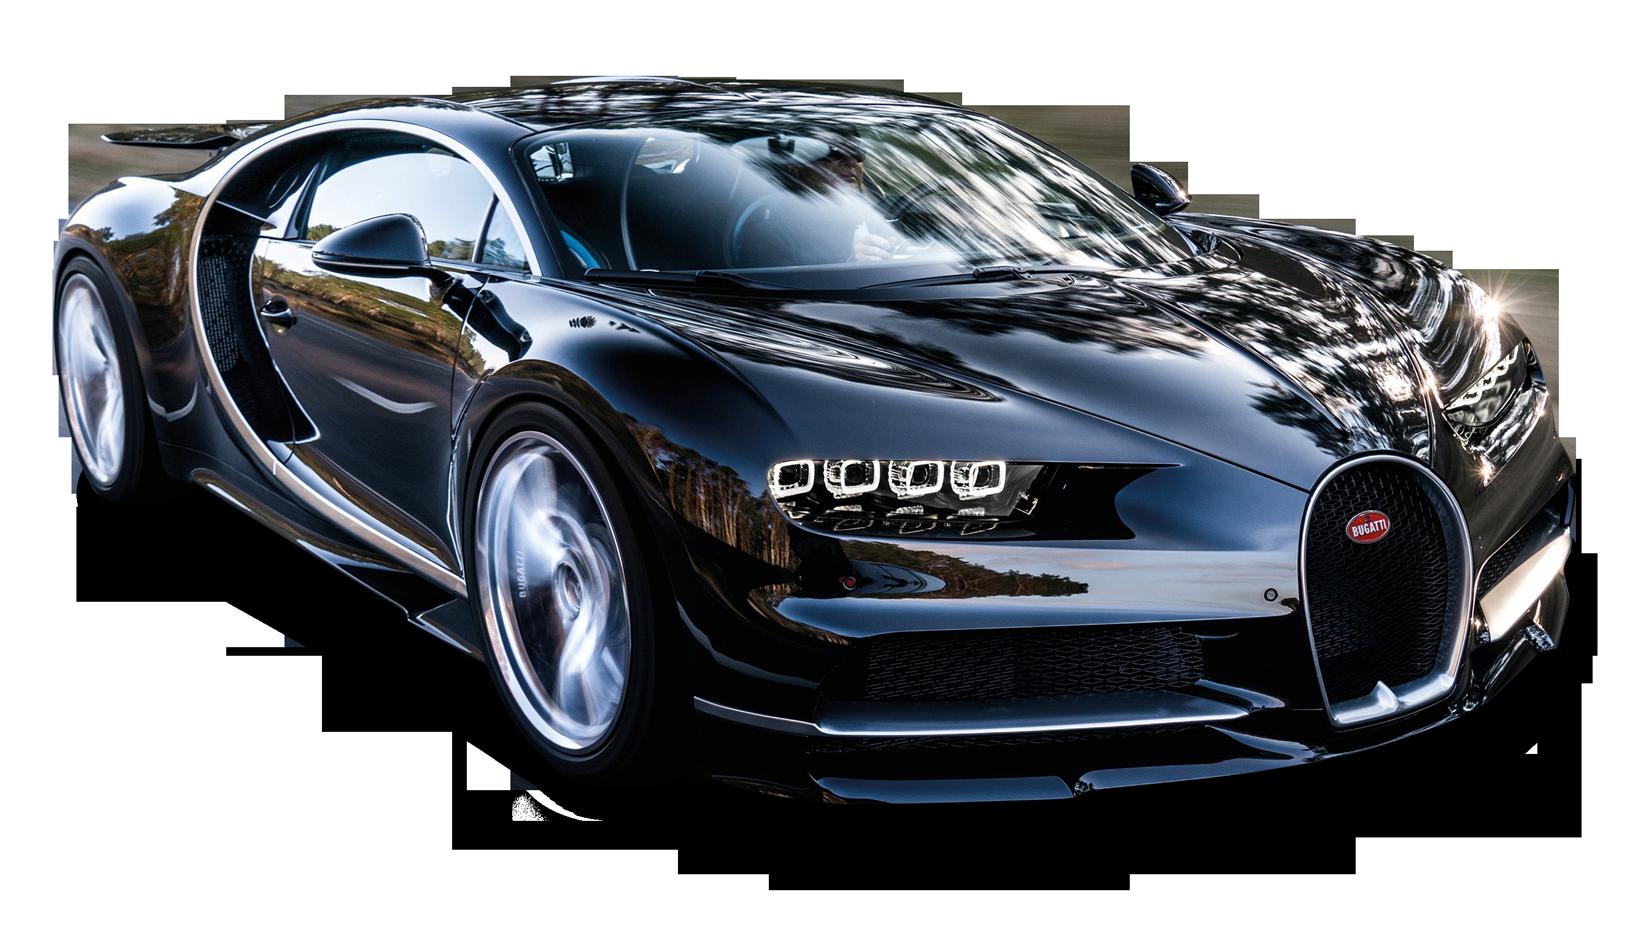 Bugatti Png Image Purepng Free Transparent Cc0 Png Image Library